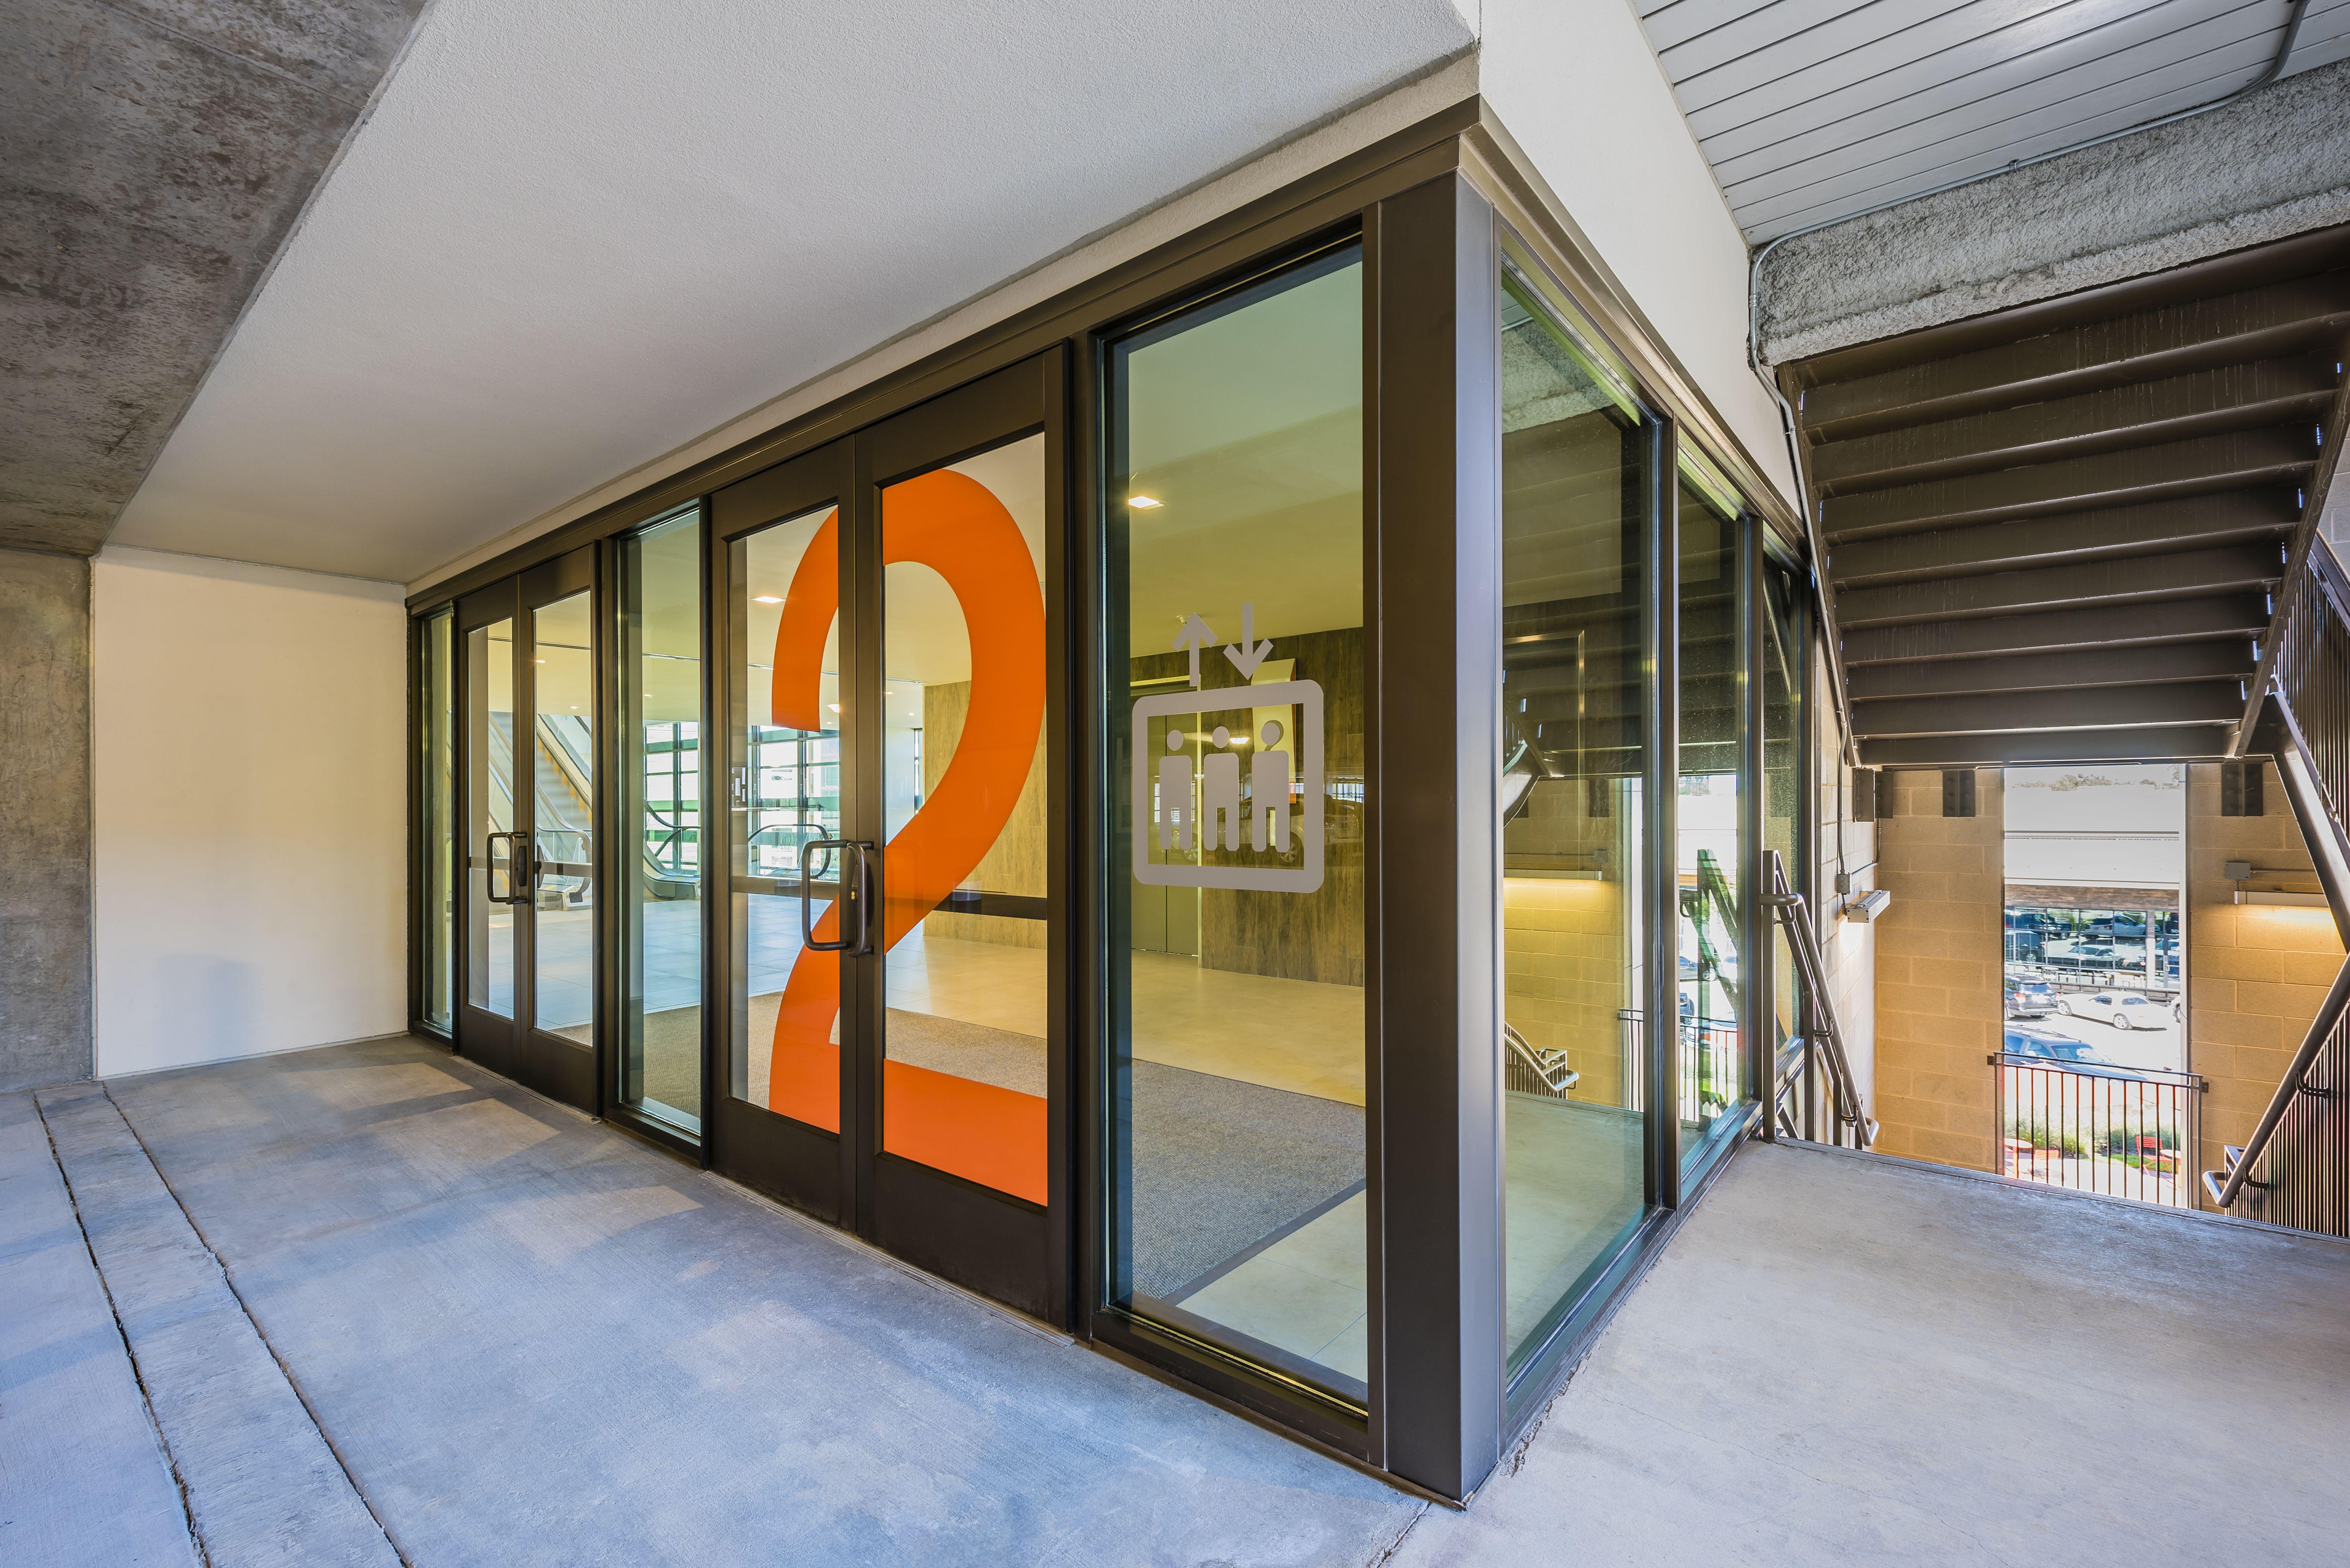 Placemaking Design Firm In Dallas Texas Garage Design Interior Environmental Design Design Firms